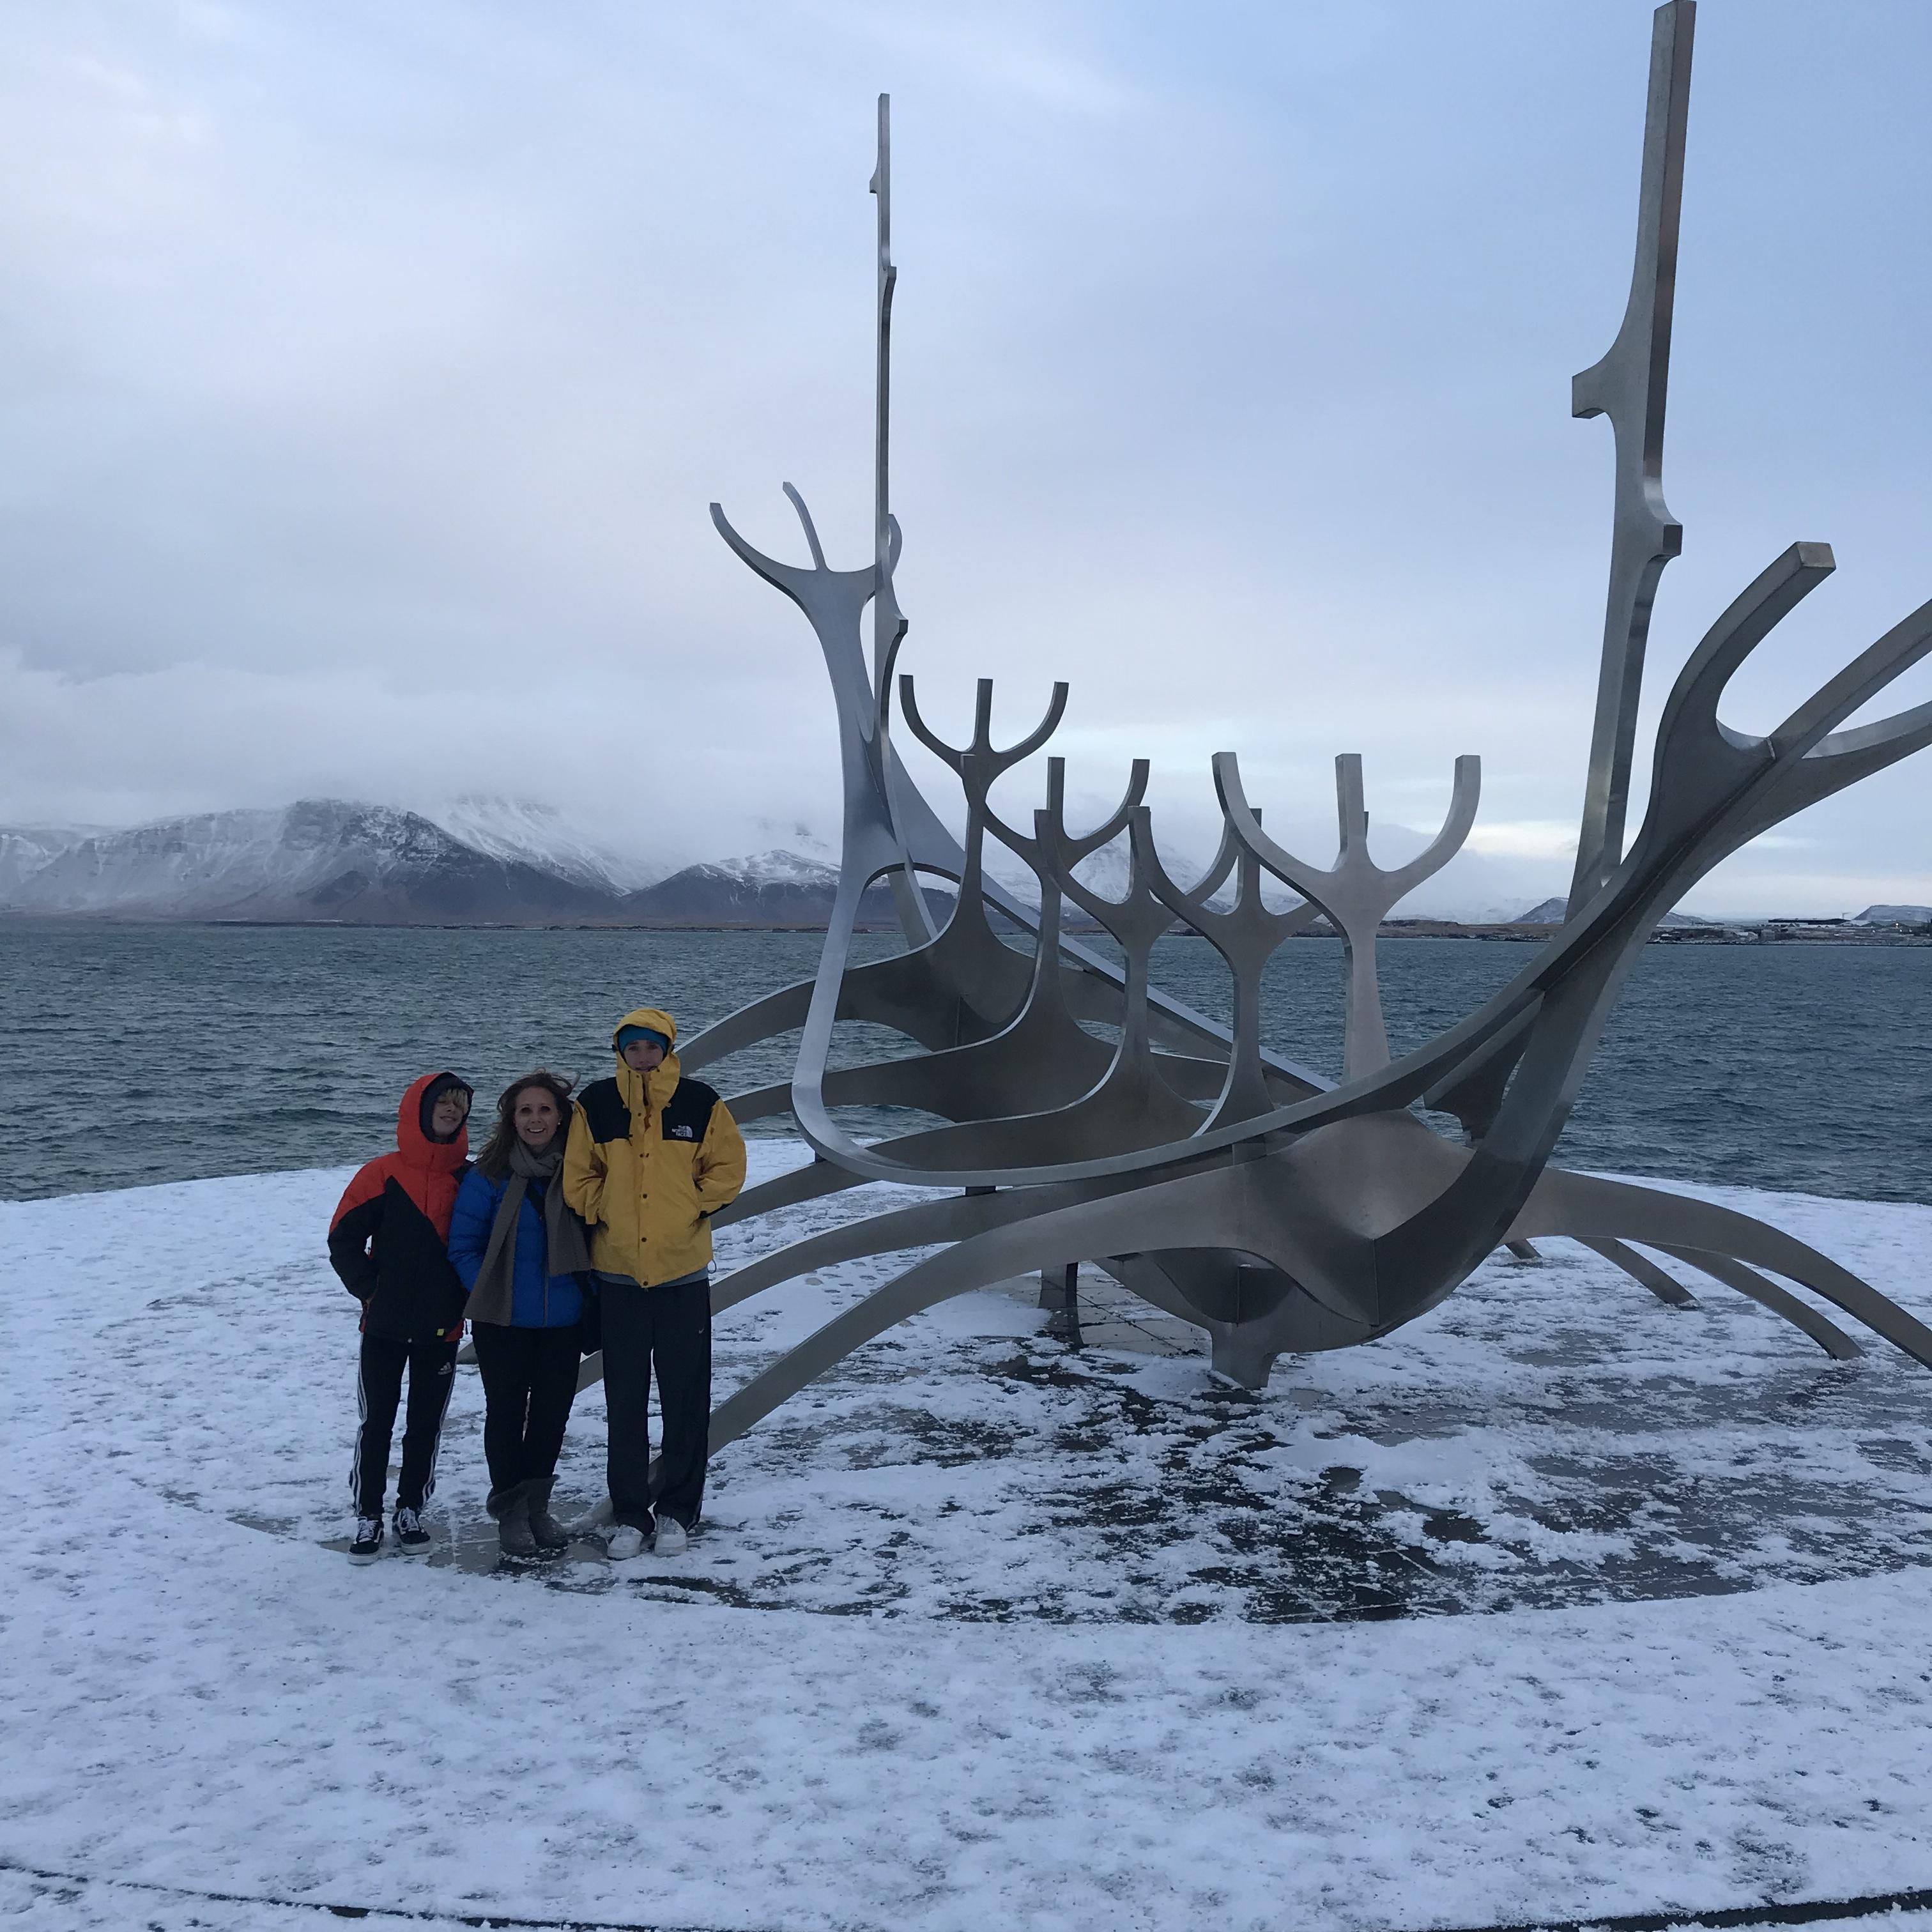 Reykjavik Iceland sun voyager art